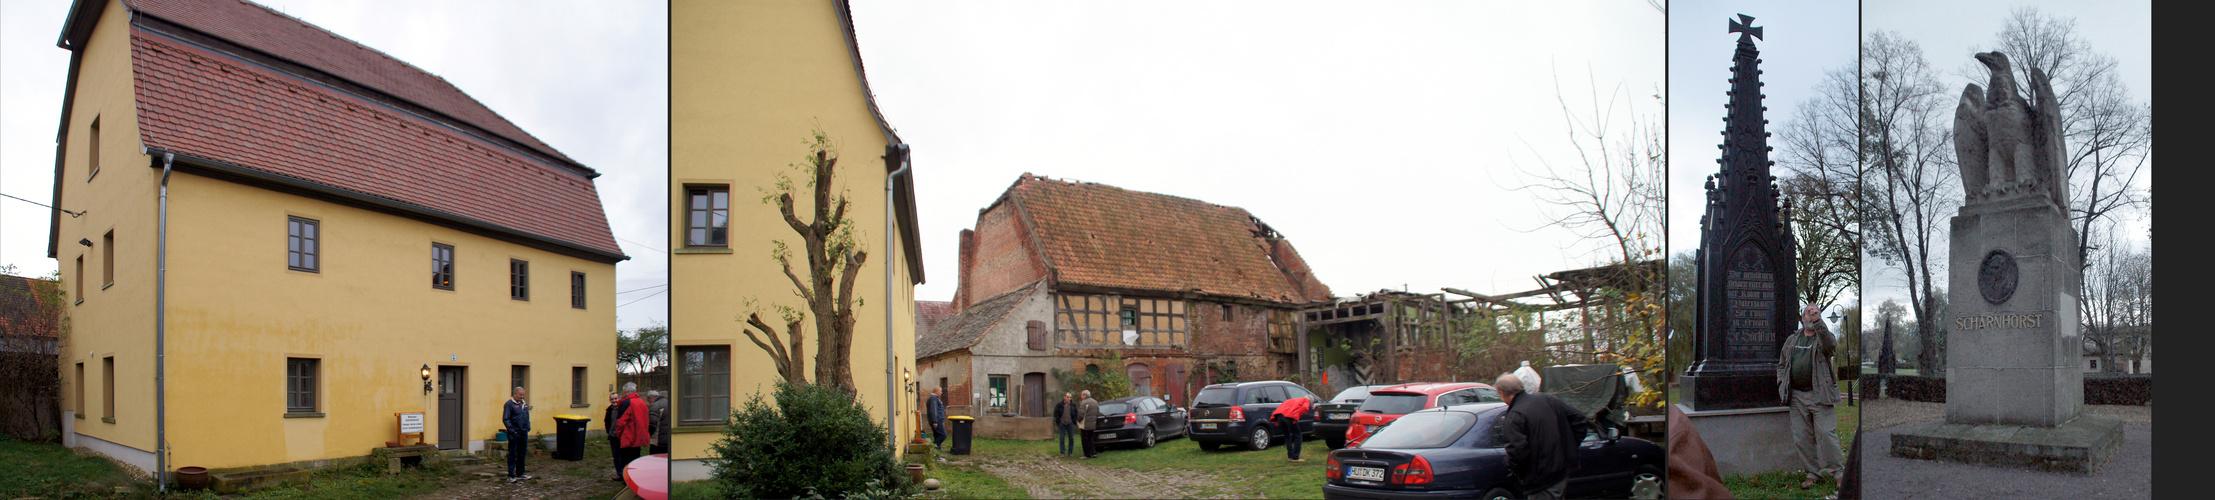 Das Marschall-Ney-Haus zu Kaja